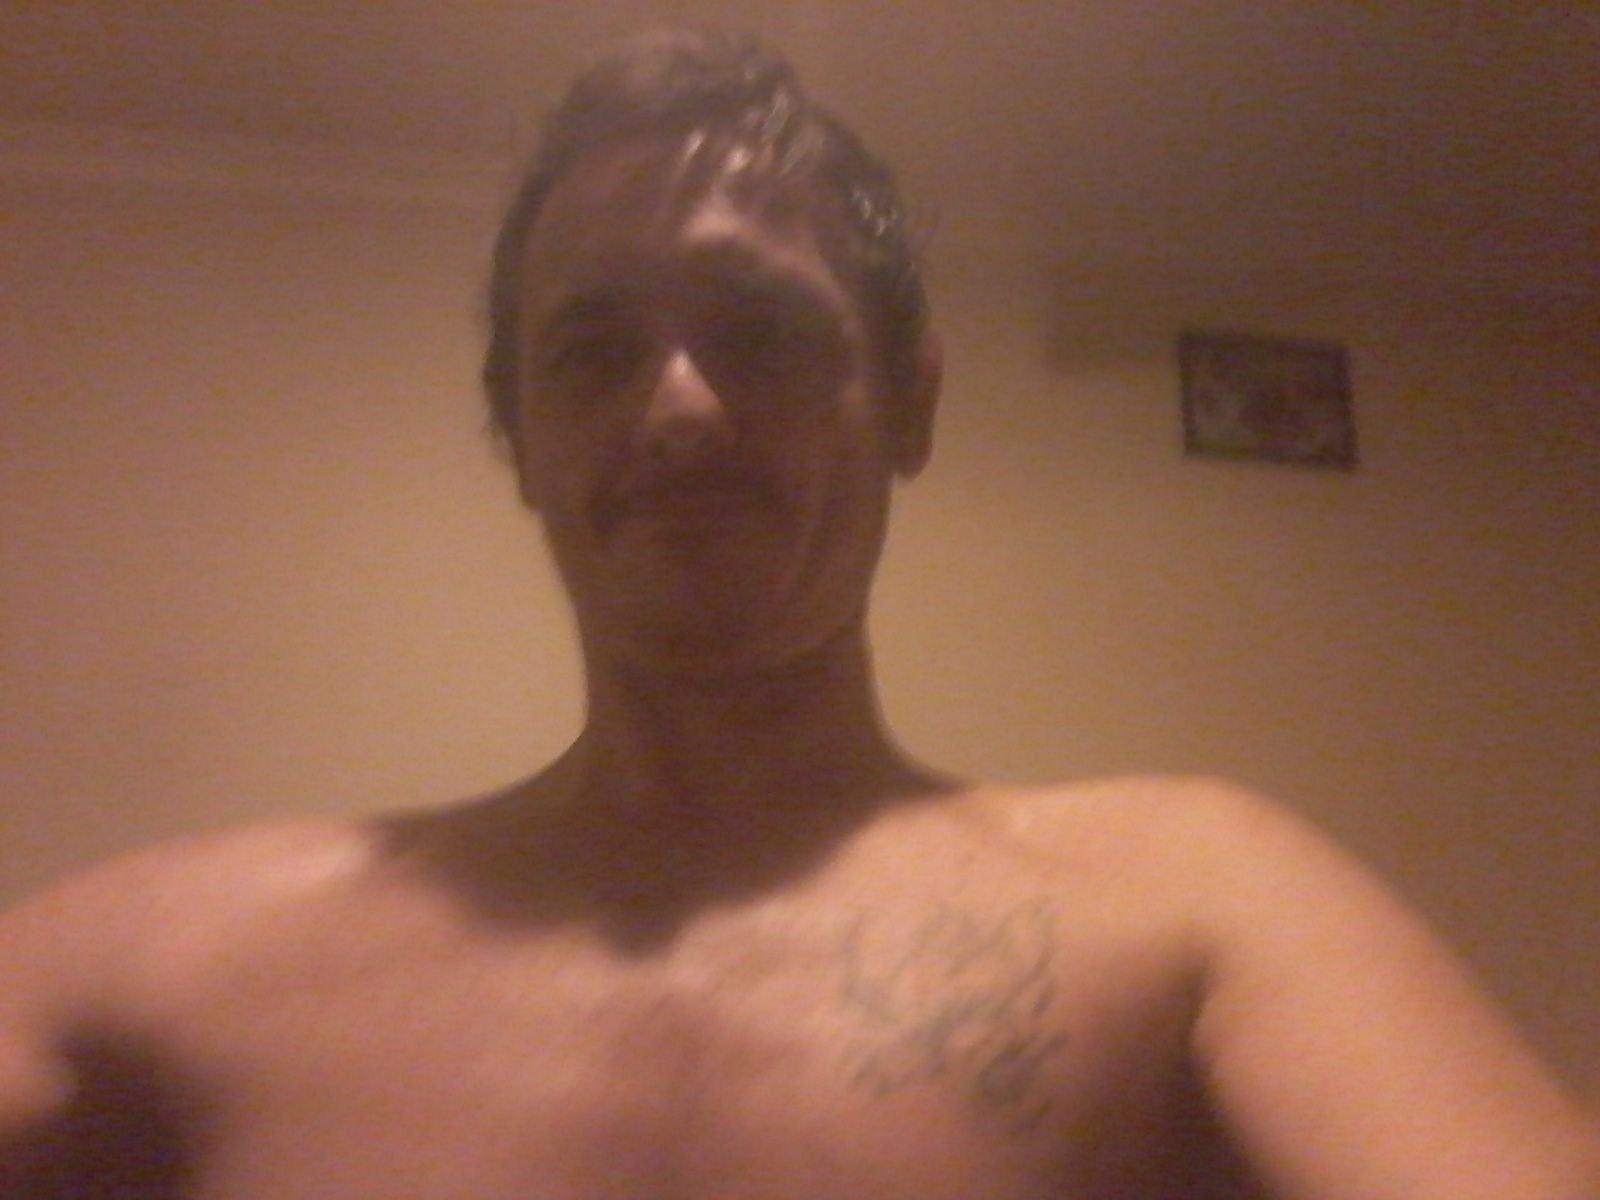 Brett1 from Queensland,Australia